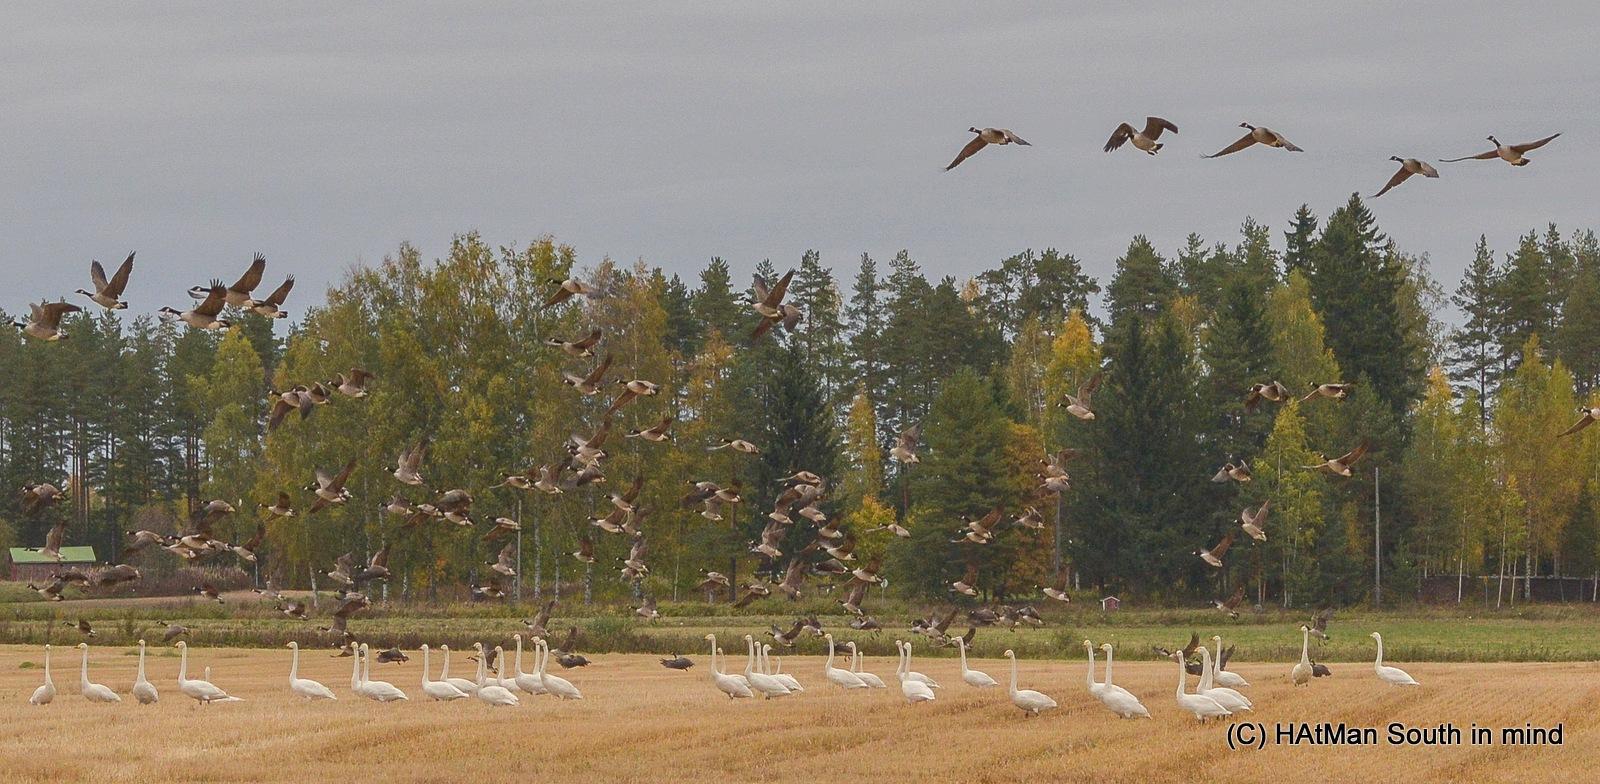 Birds leaving Finland by HeikkiHAtMAN PHOTOGRAPHY